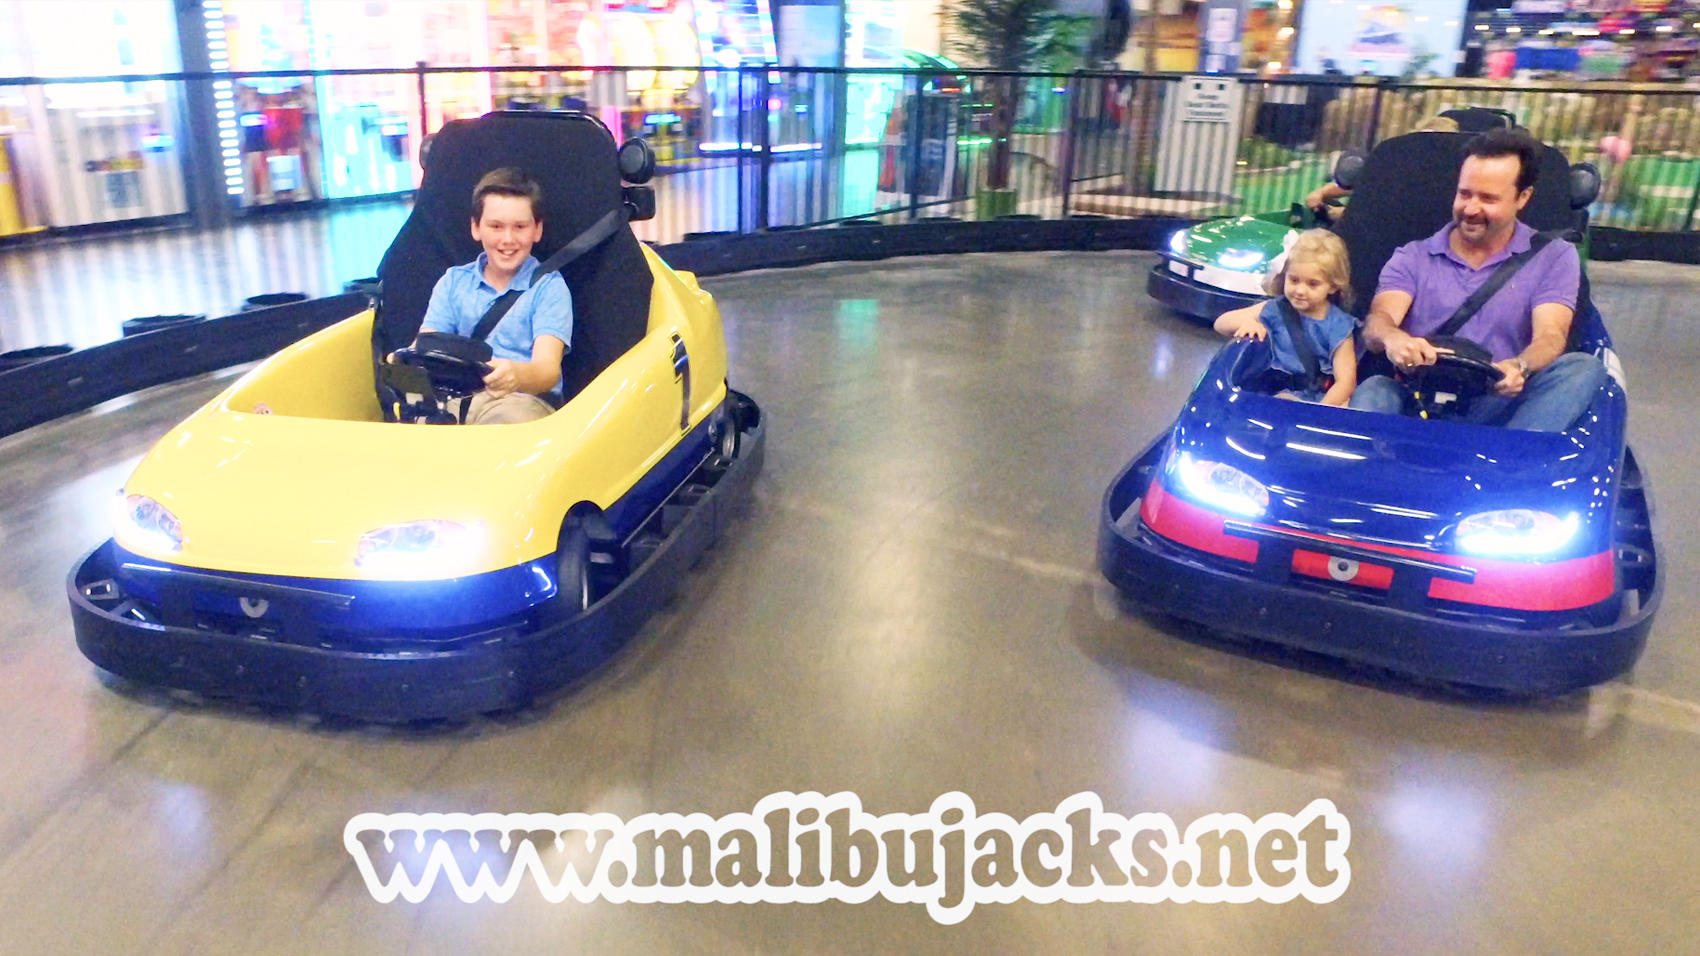 Malibu Jack's Louisville image 4